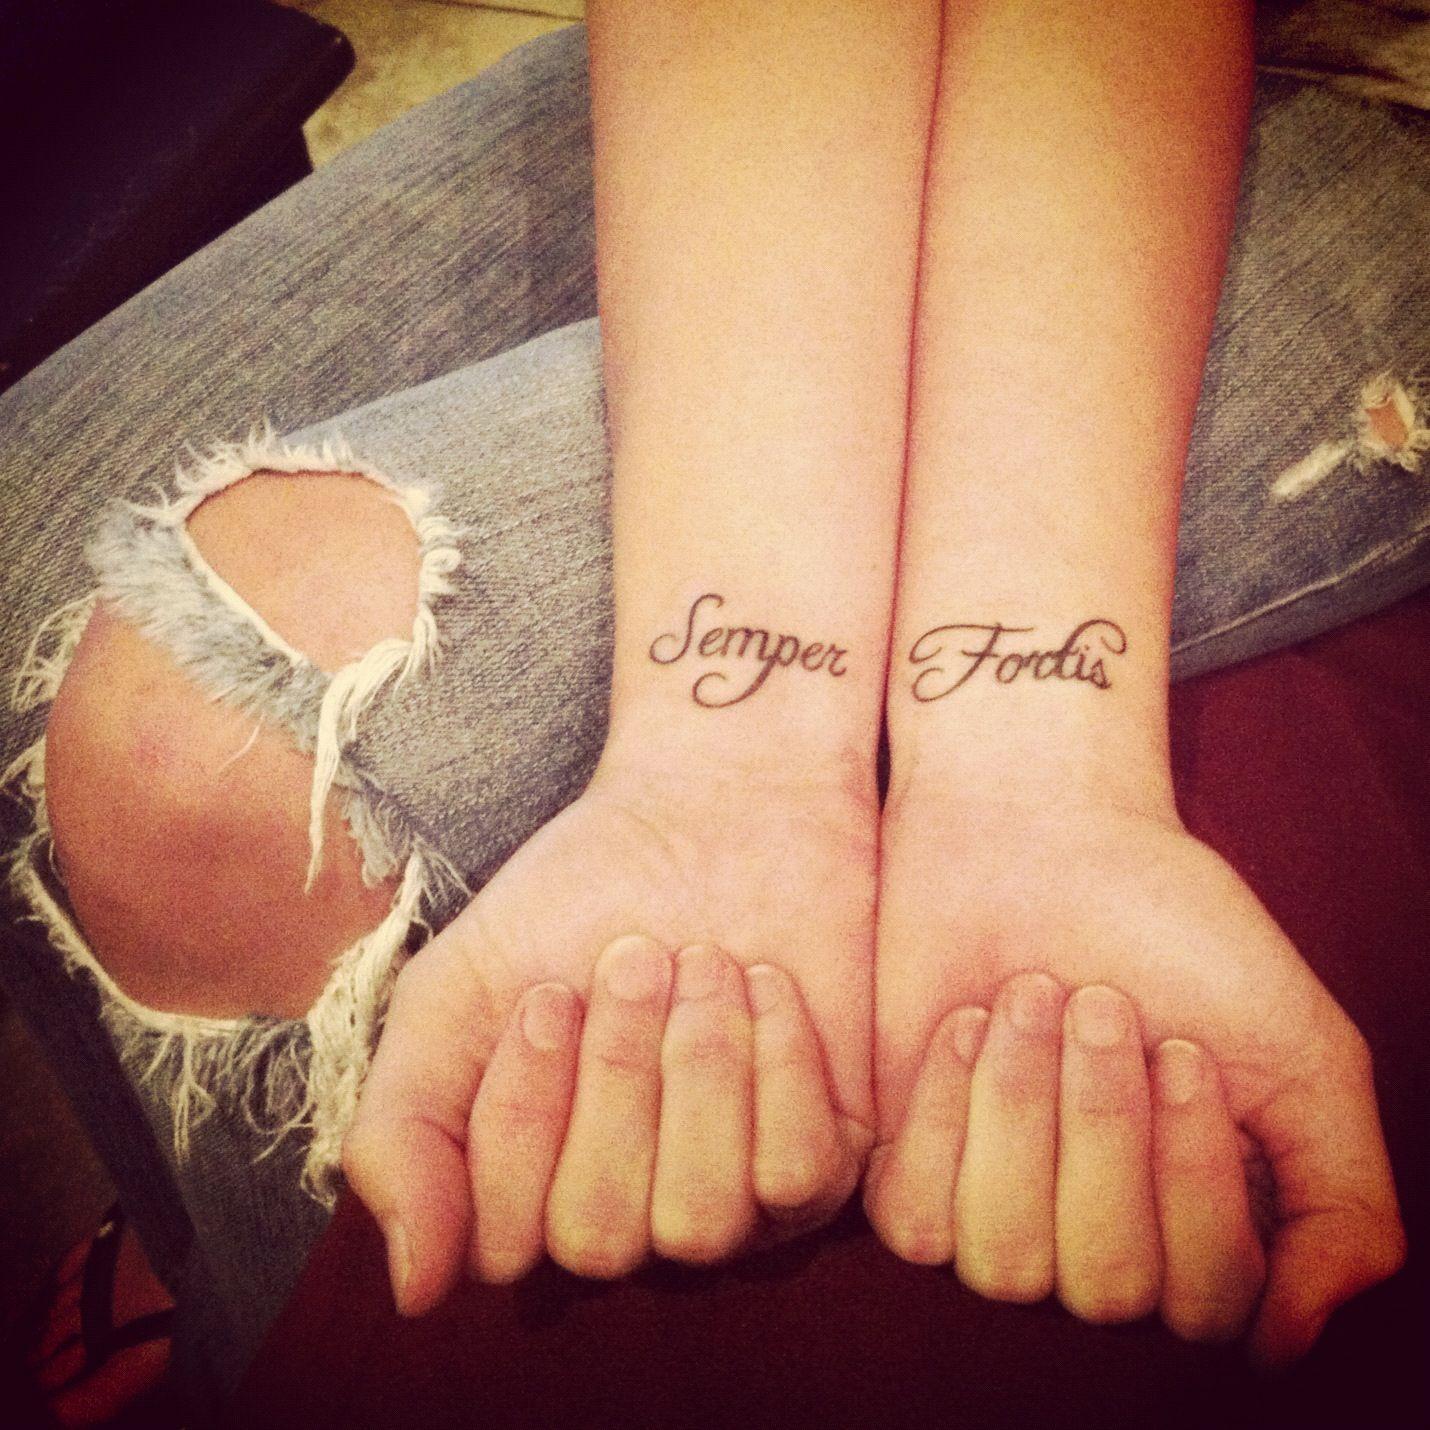 My Tattoos Semper Fortis Always Courageous Ink